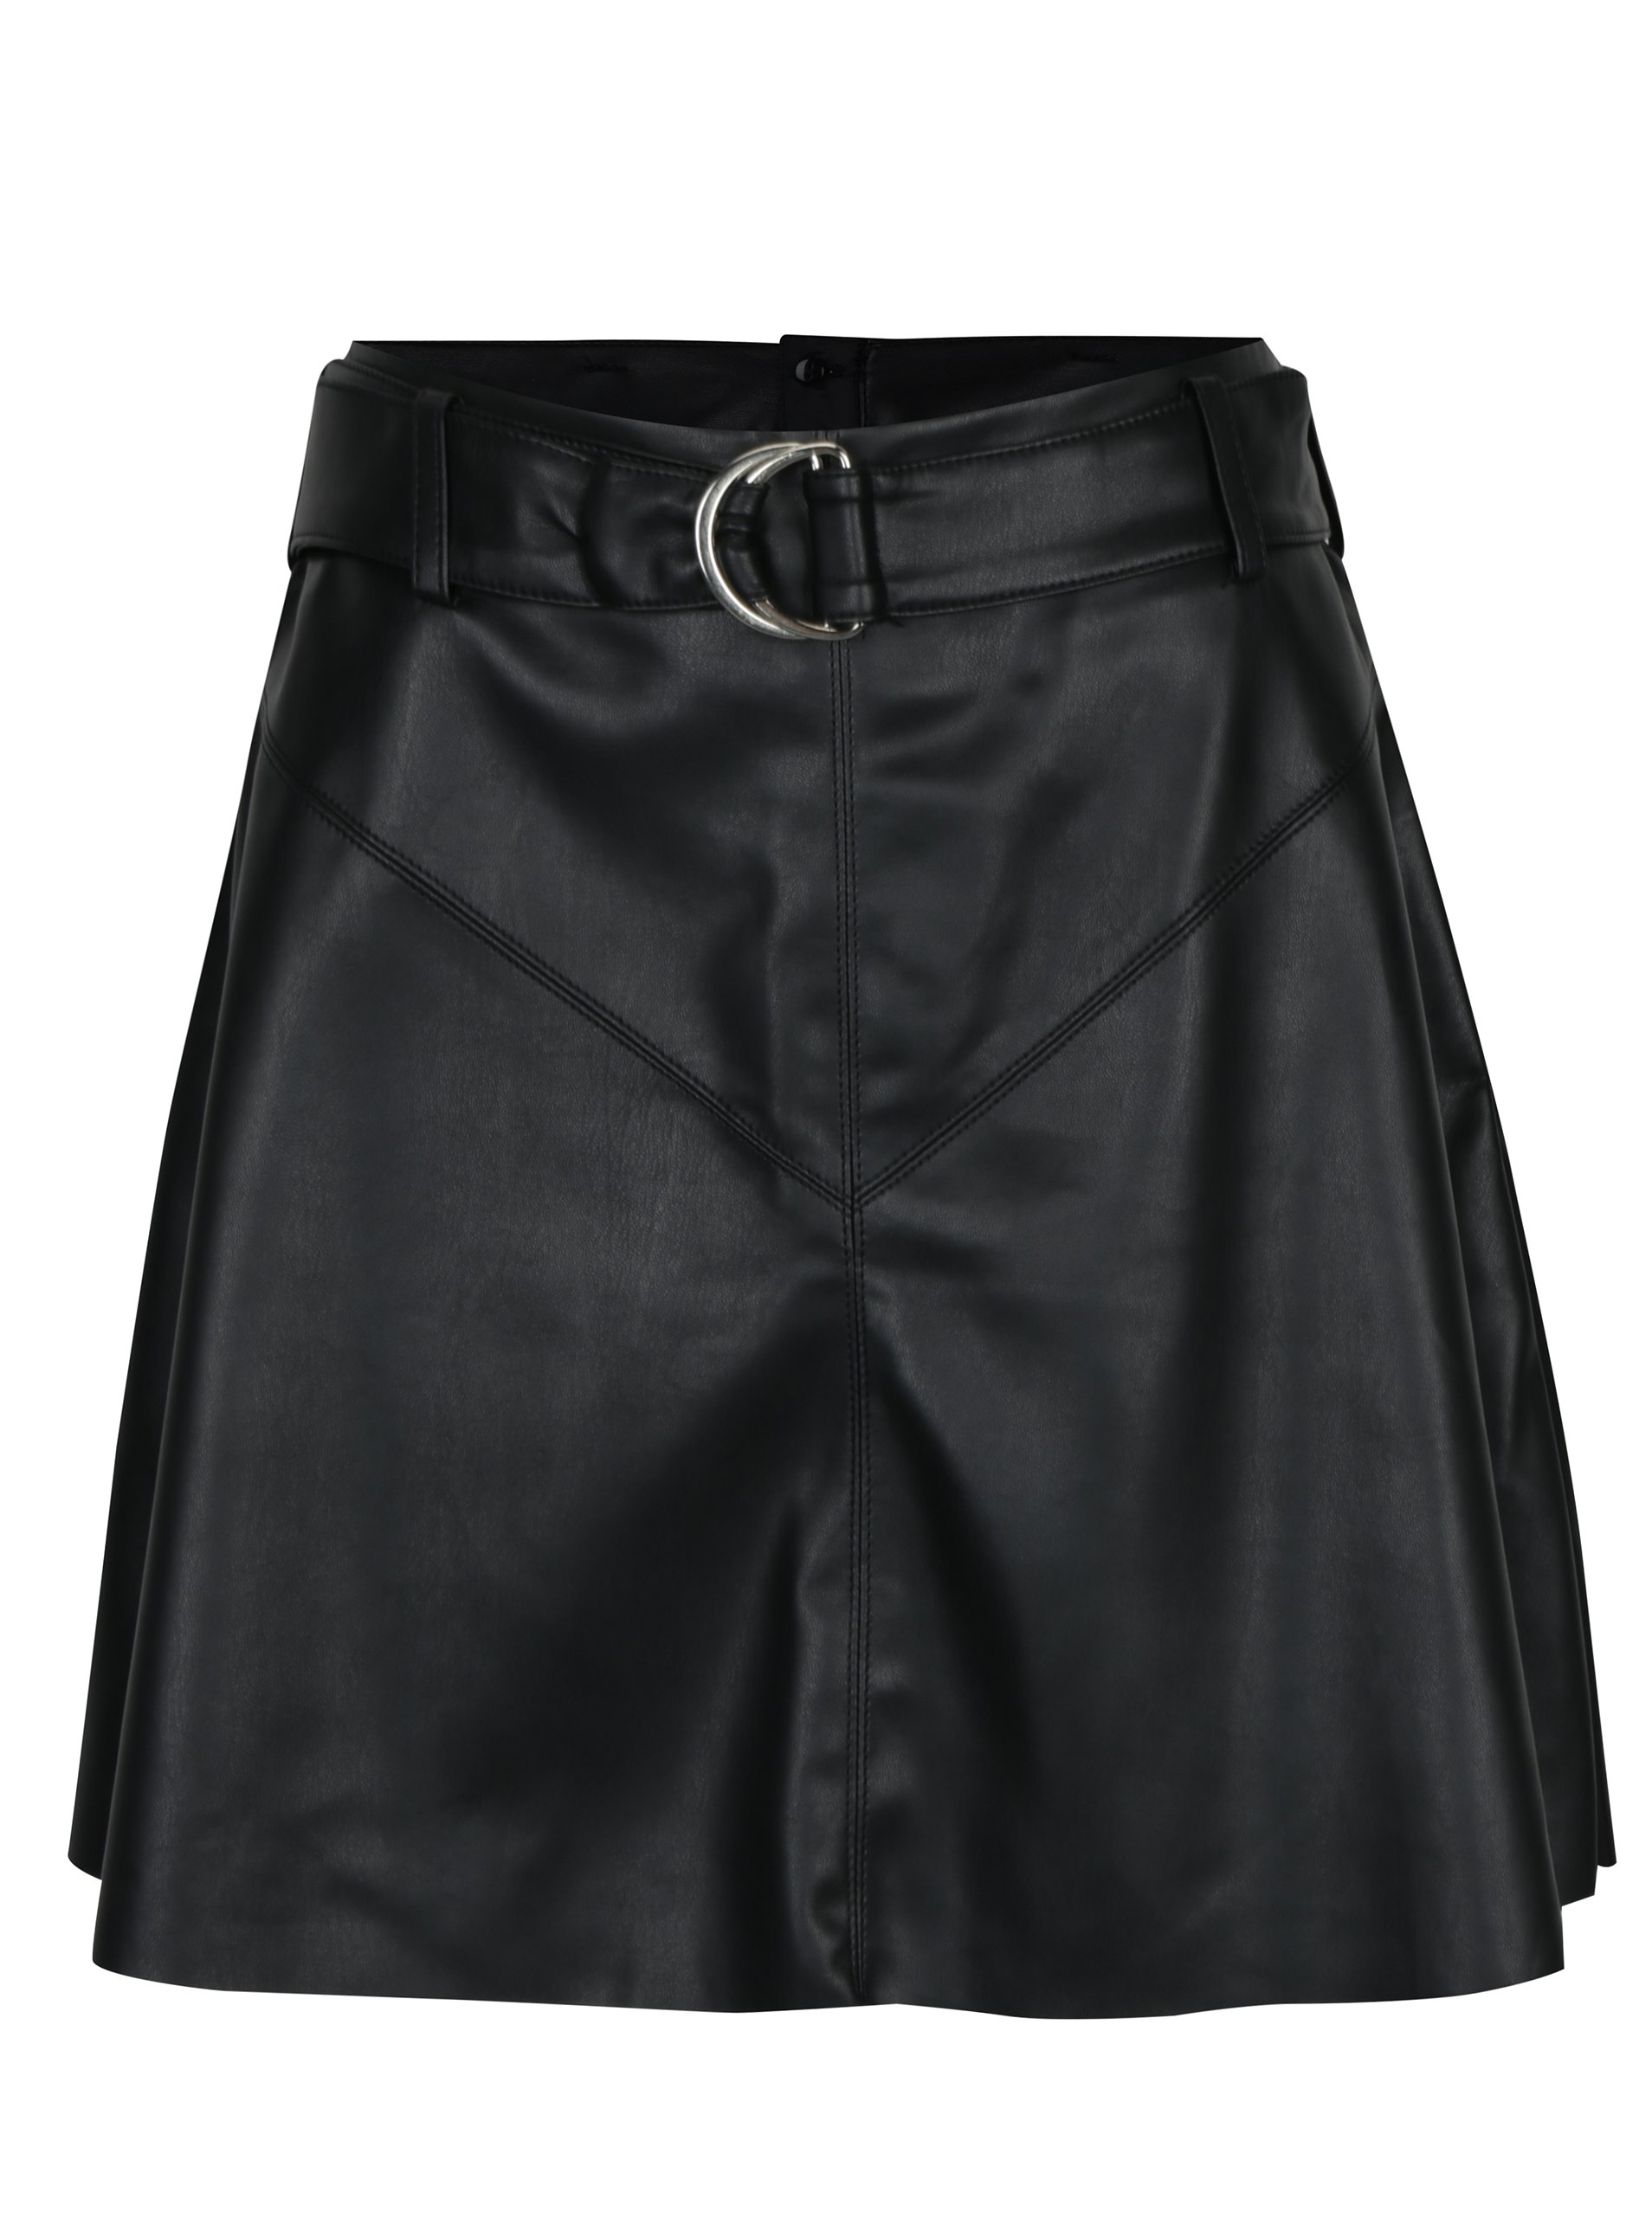 Černá koženková sukně s páskem VERO MODA Loa